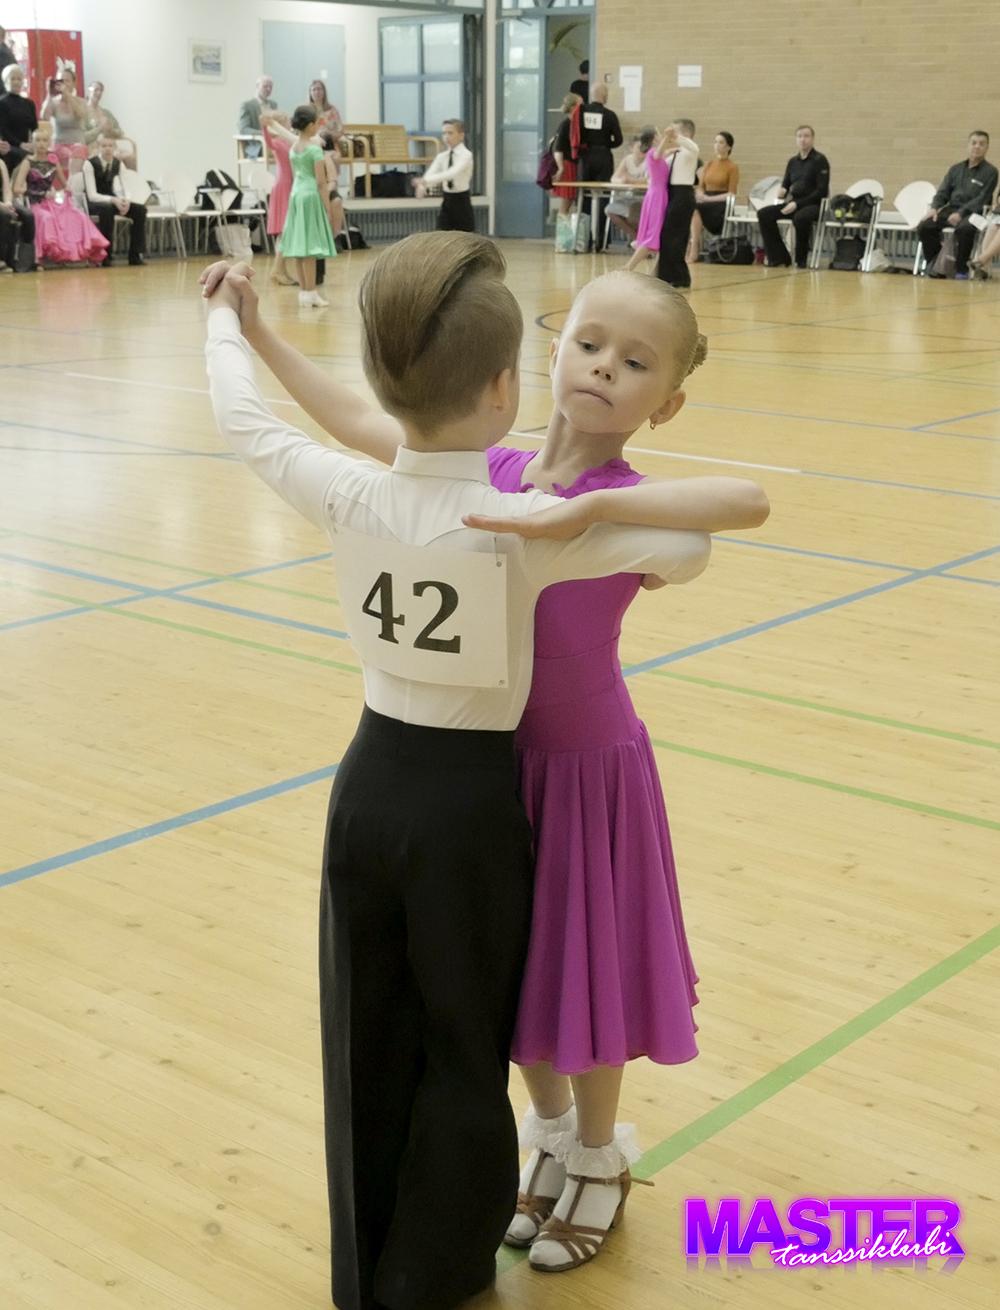 Tanssiklubi Master aluekilpailu